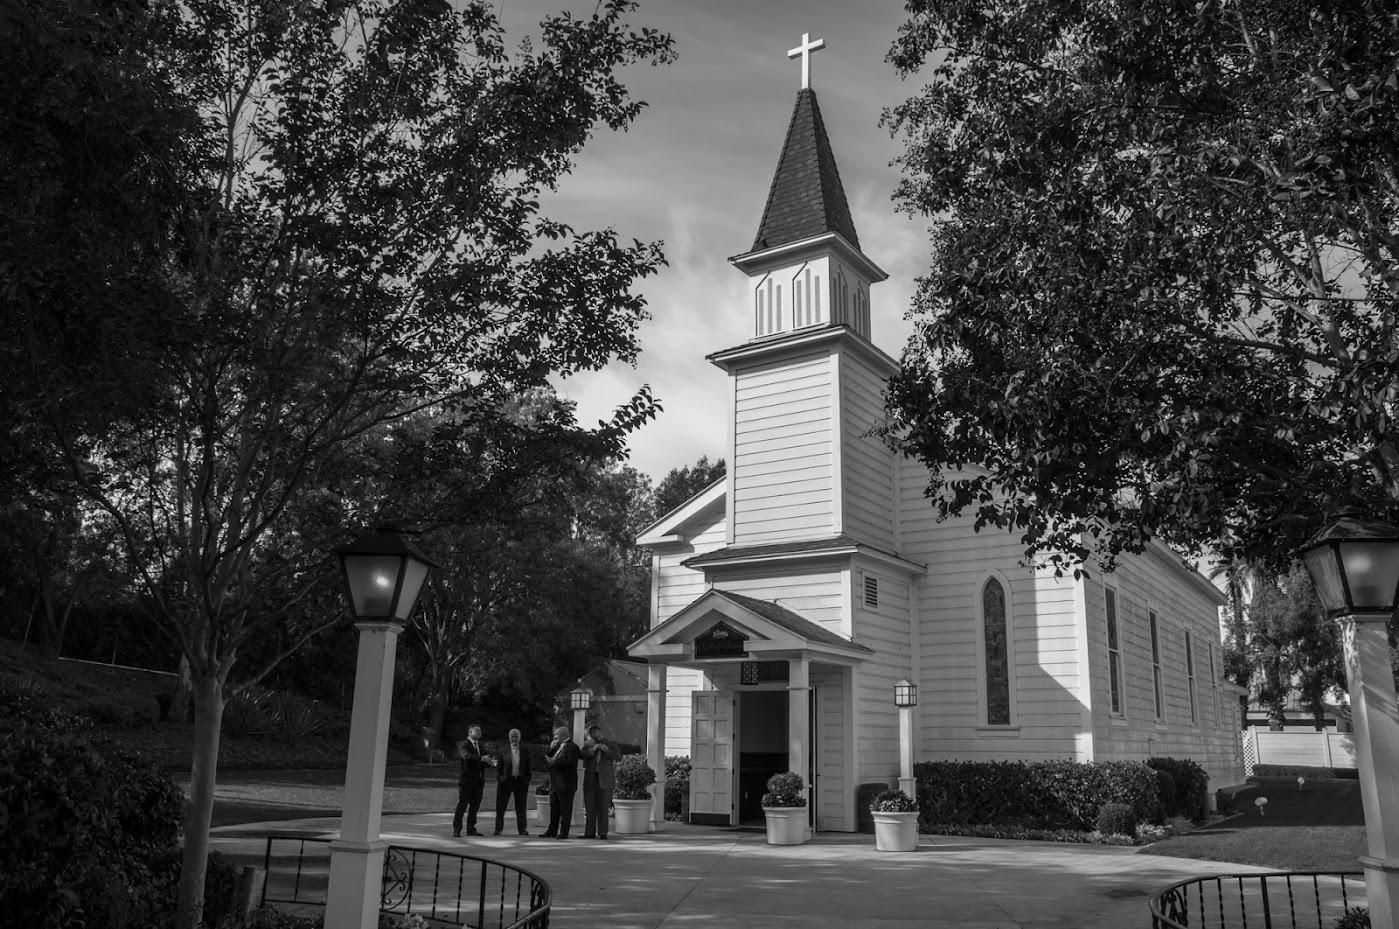 Church of reflections, Buena Park, CA